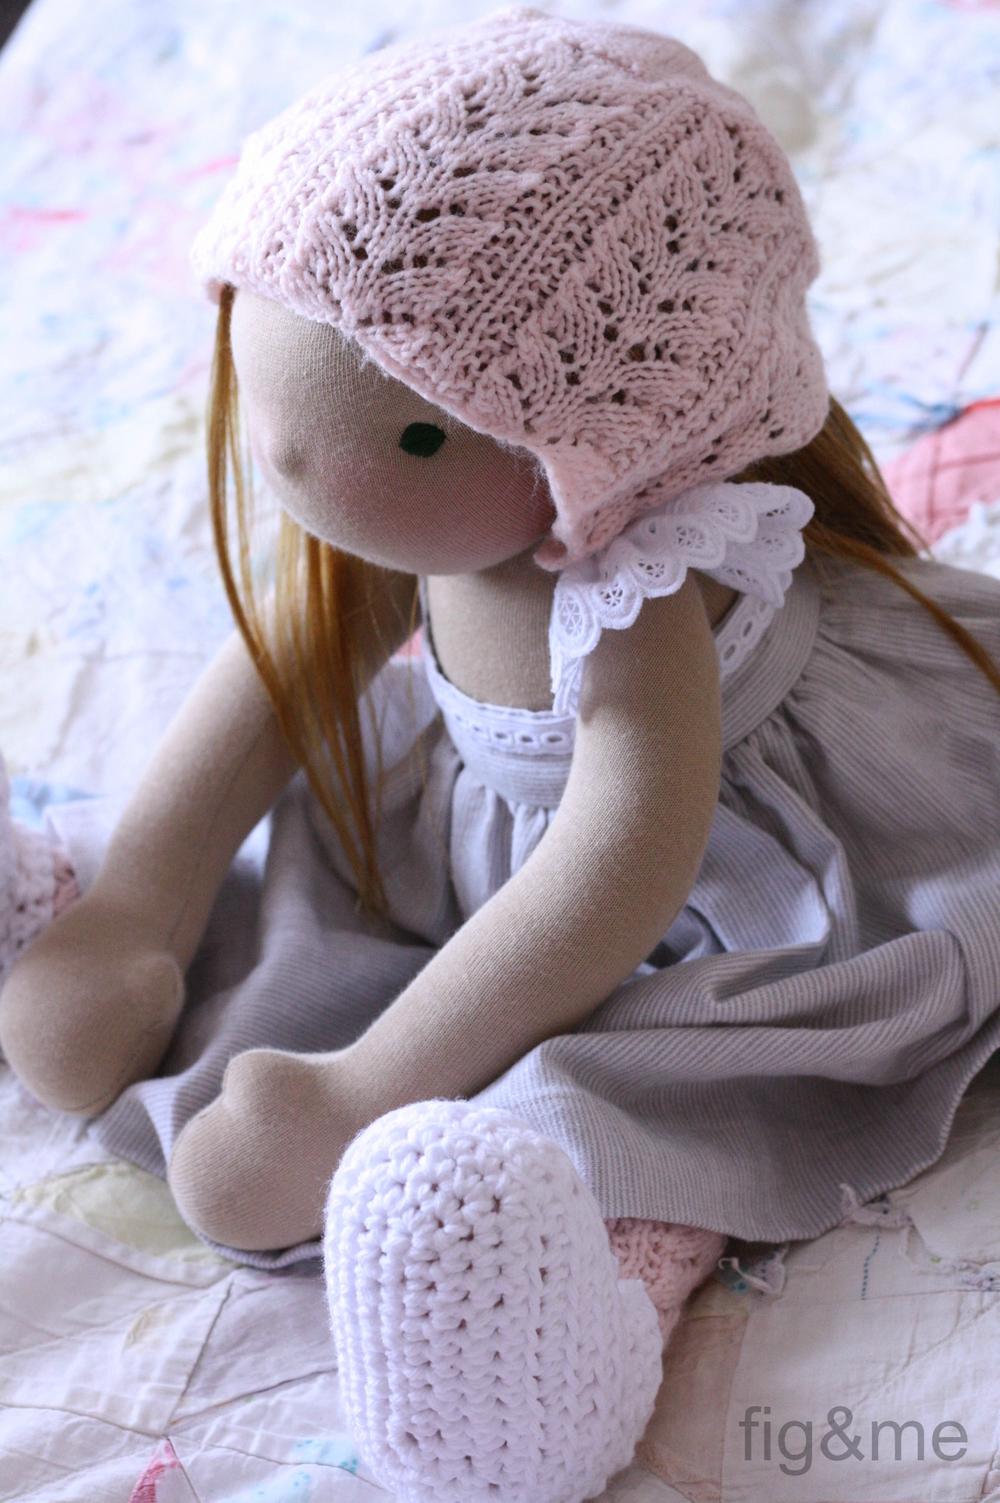 prettygirl-byfigandme.jpg